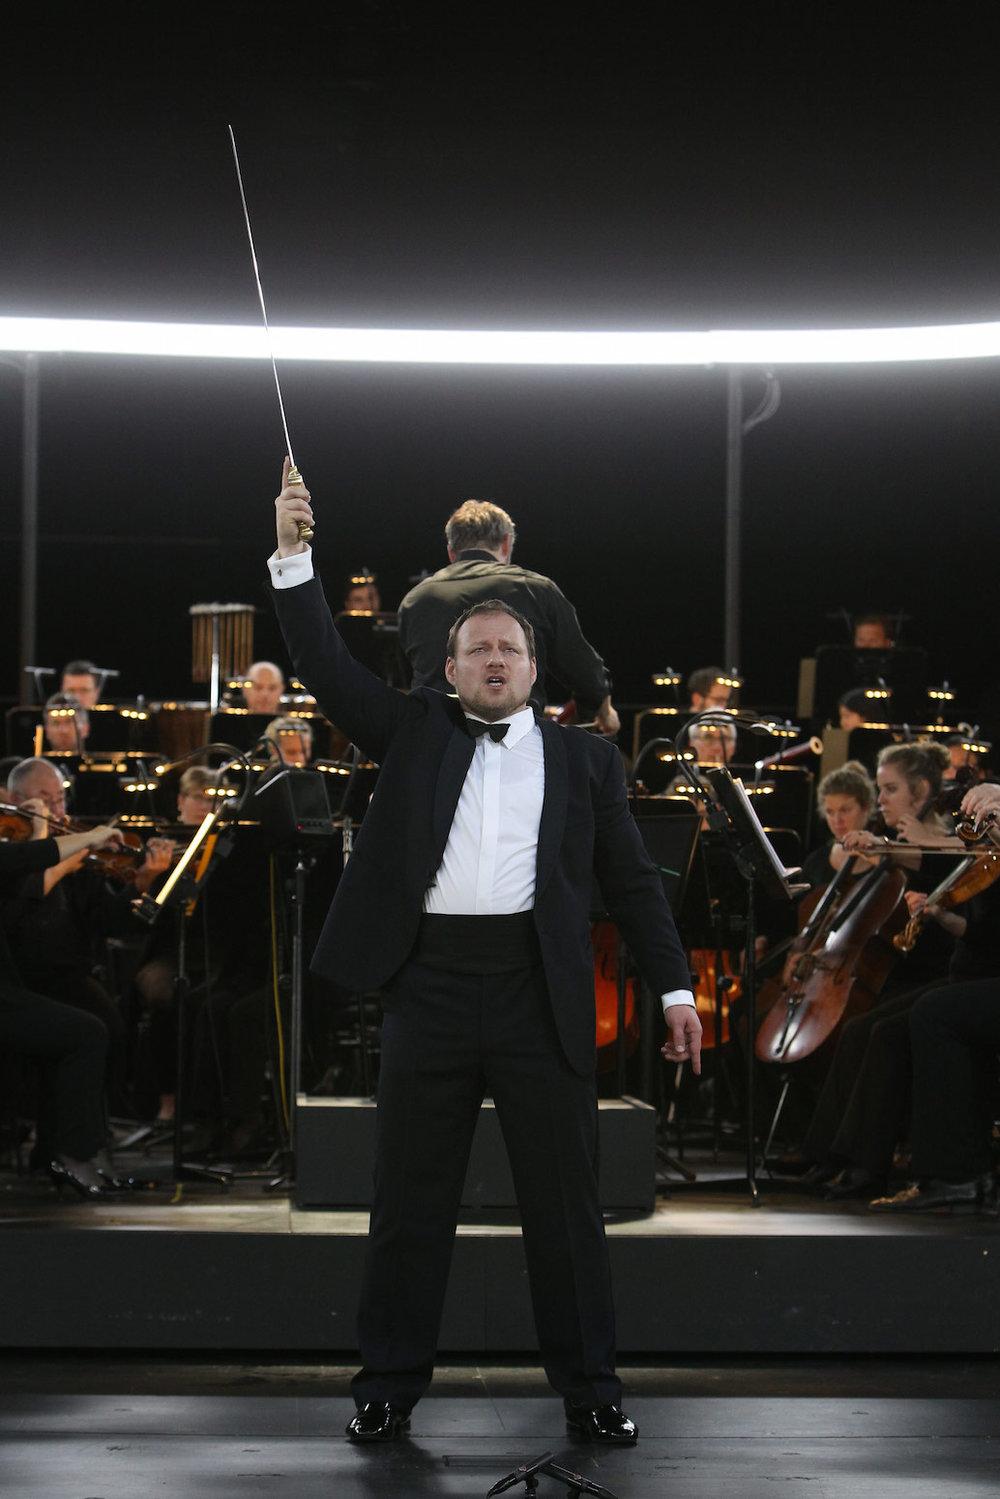 Theater Bremen, Parsifal    with: Markus Poschner, Bremer Philharmoniker    photo credit: Jörg Landsberg